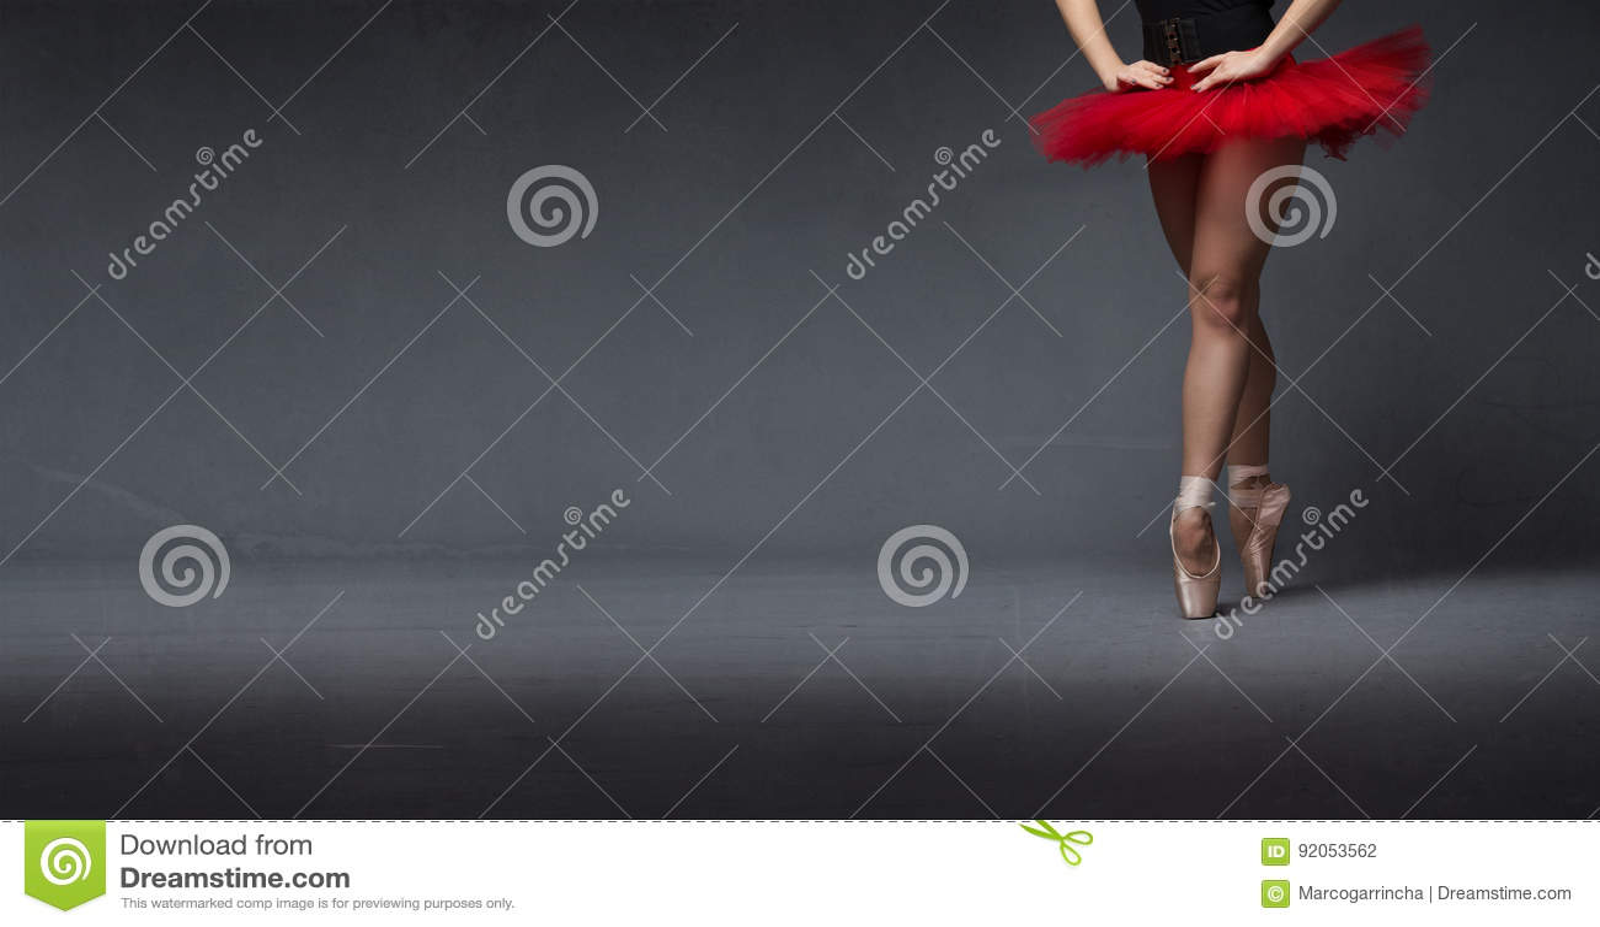 Rode tutu en tiptoe dichte omhooggaand